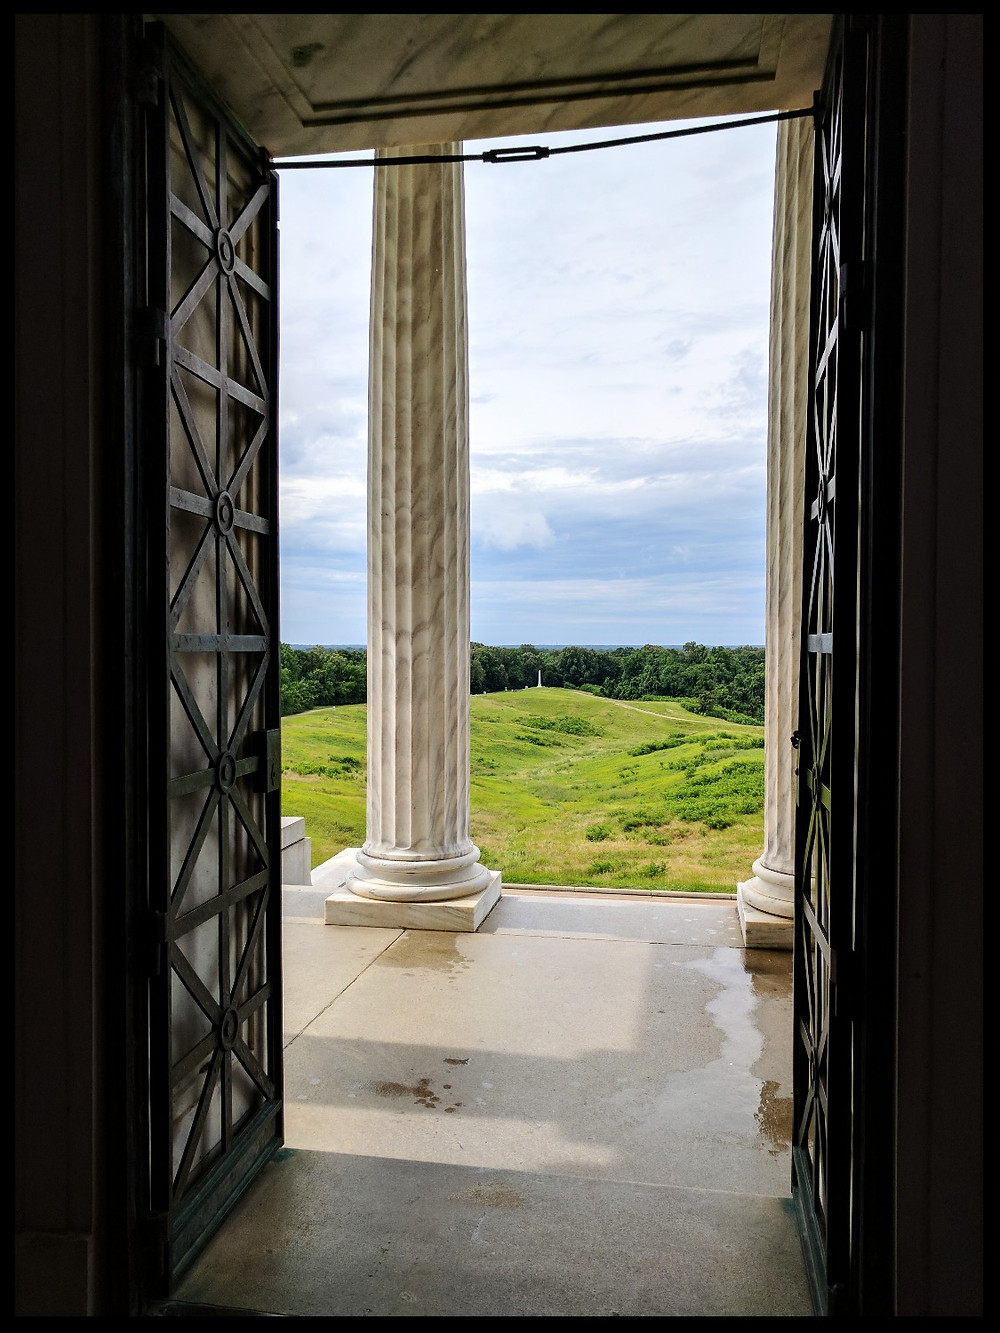 The Illinois State Memorial, The Vicksburg National Military Park, Vicksburg, Mississippi.